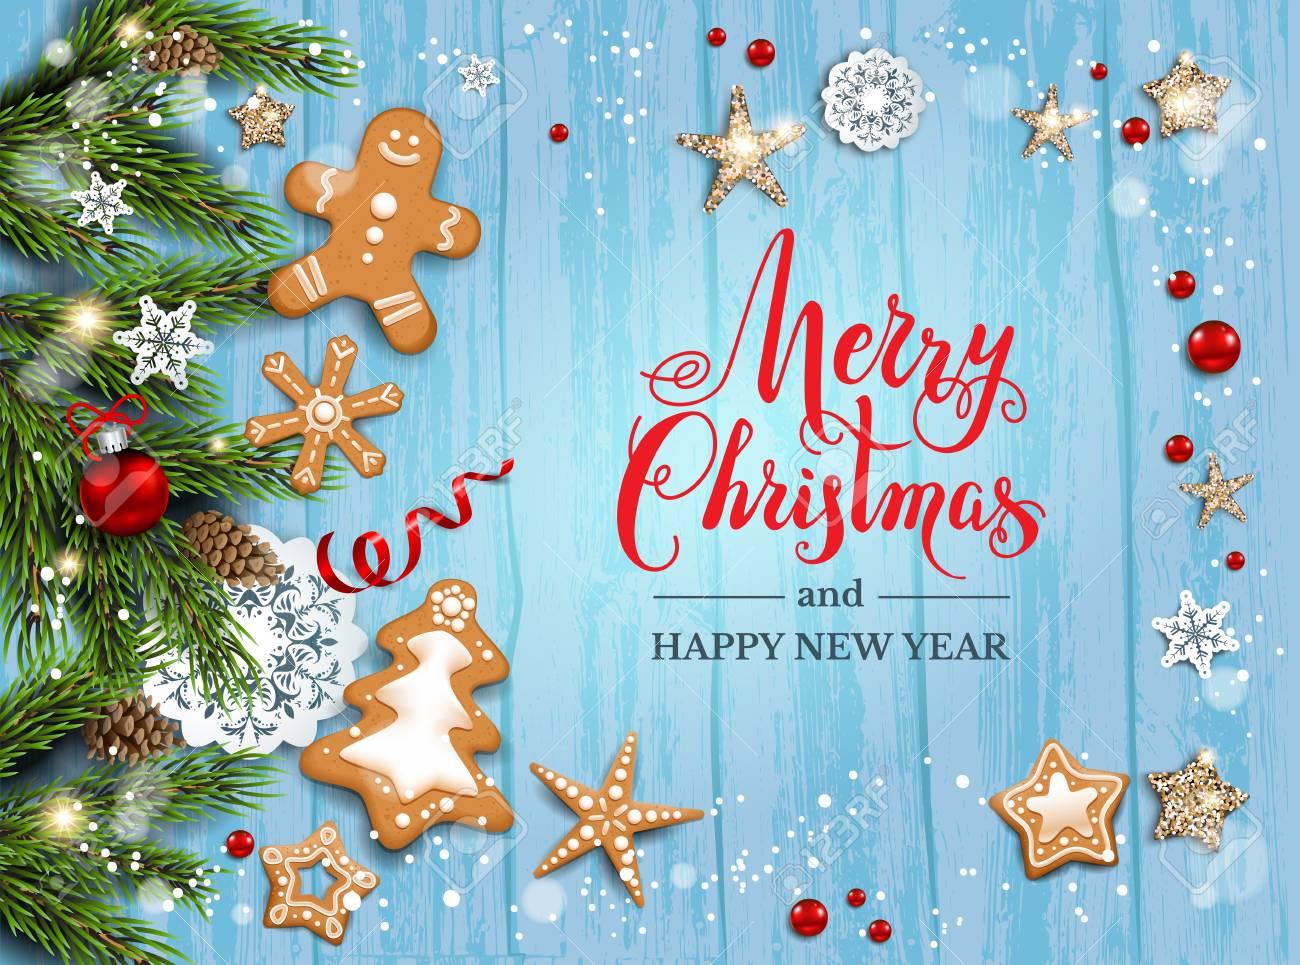 Christmas Leaflet Background.Christmas Festive Template For Banner Ticket Leaflet Card